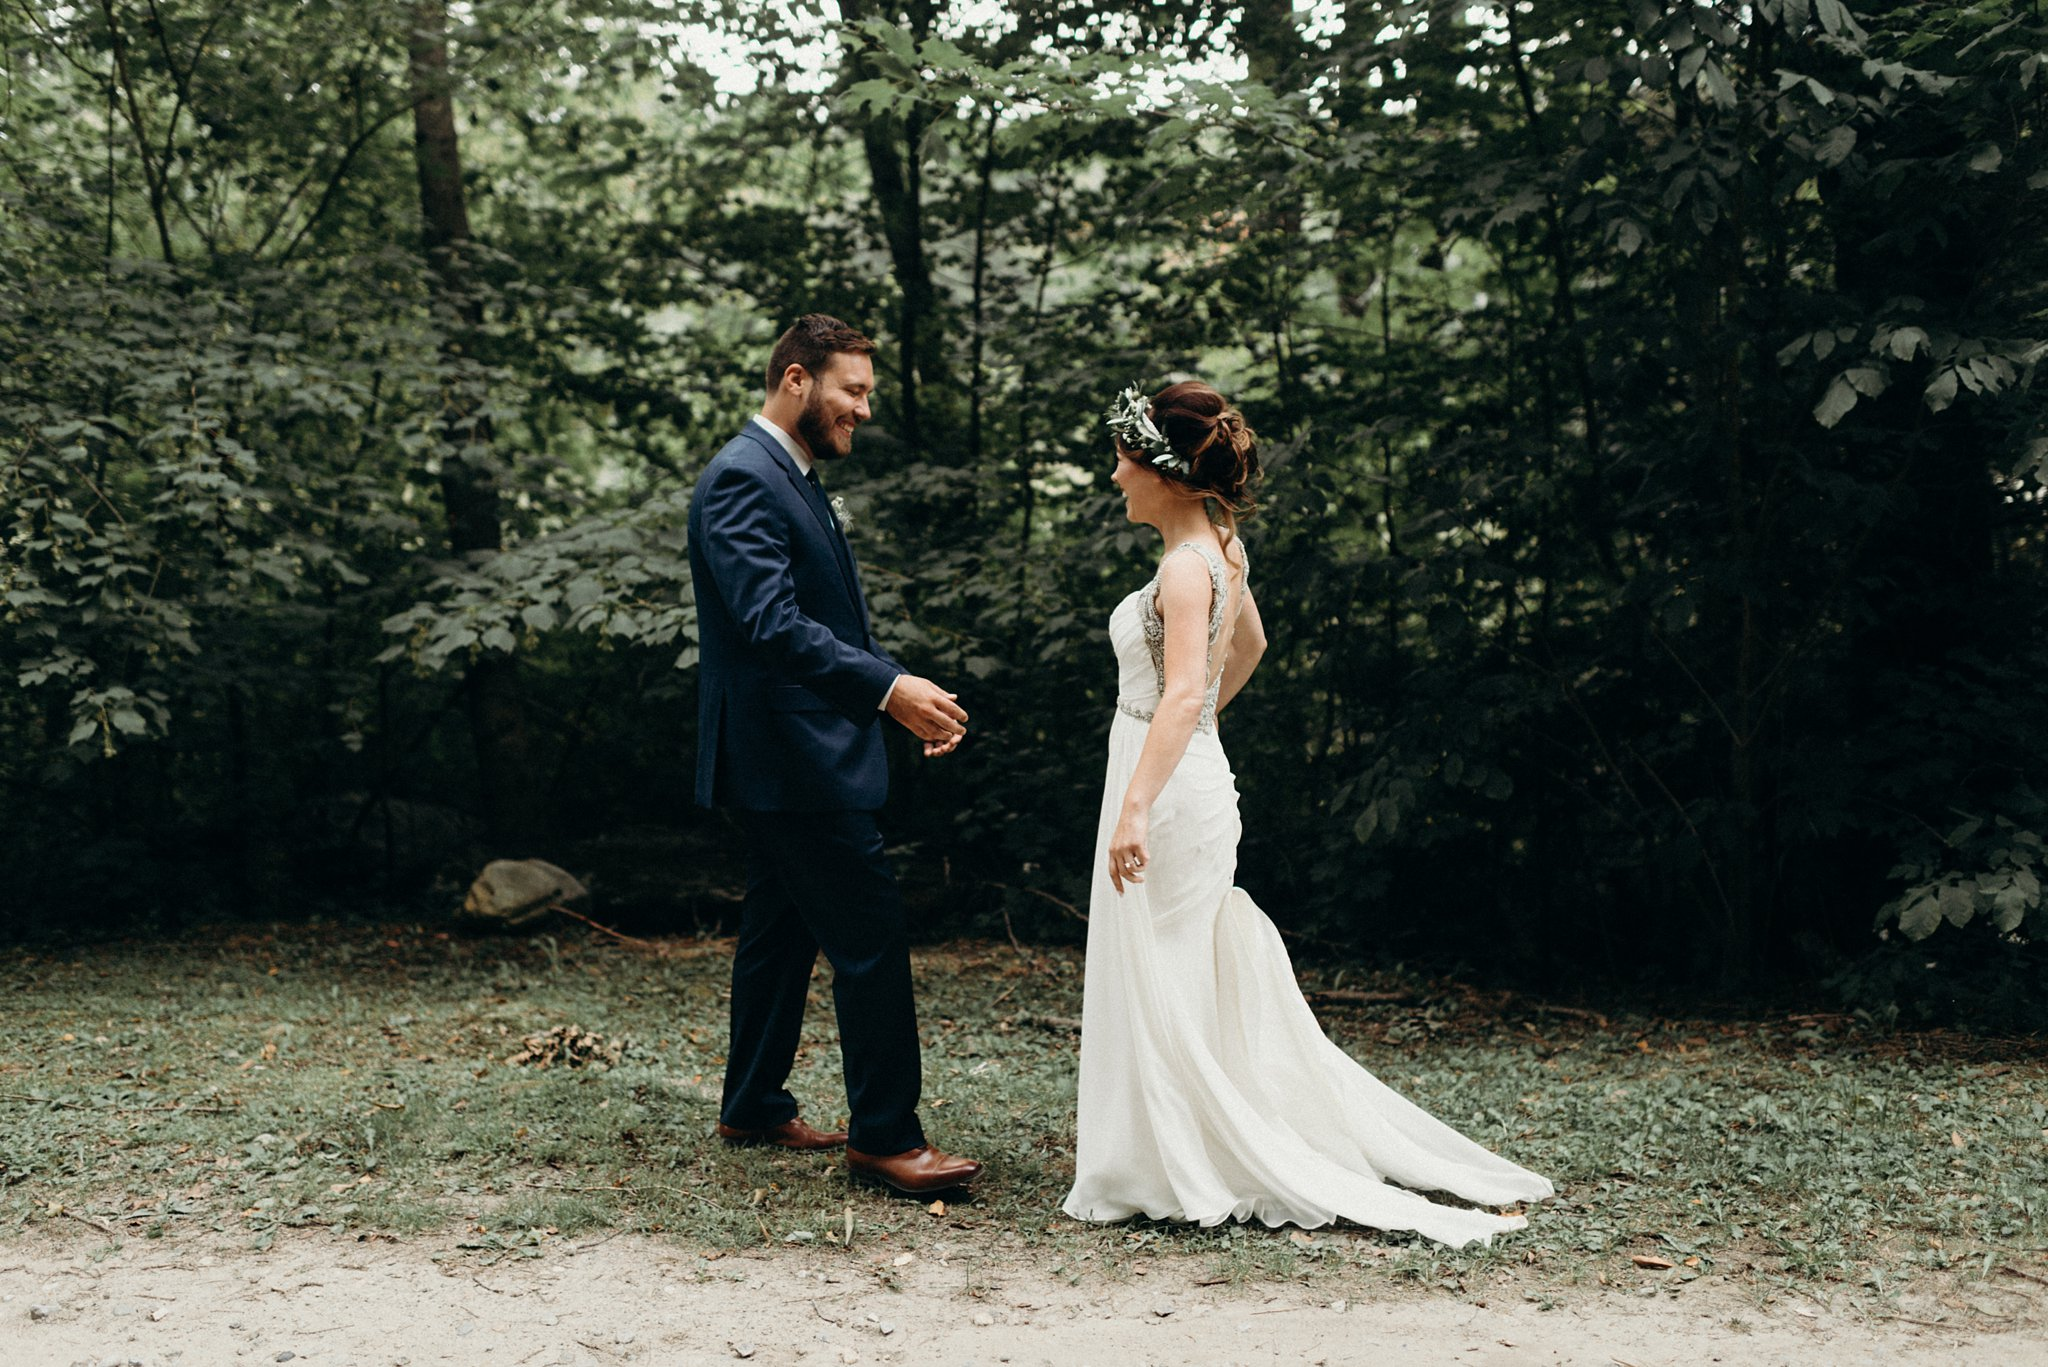 kaihla_tonai_intimate_wedding_elopement_photographer_6570.jpg